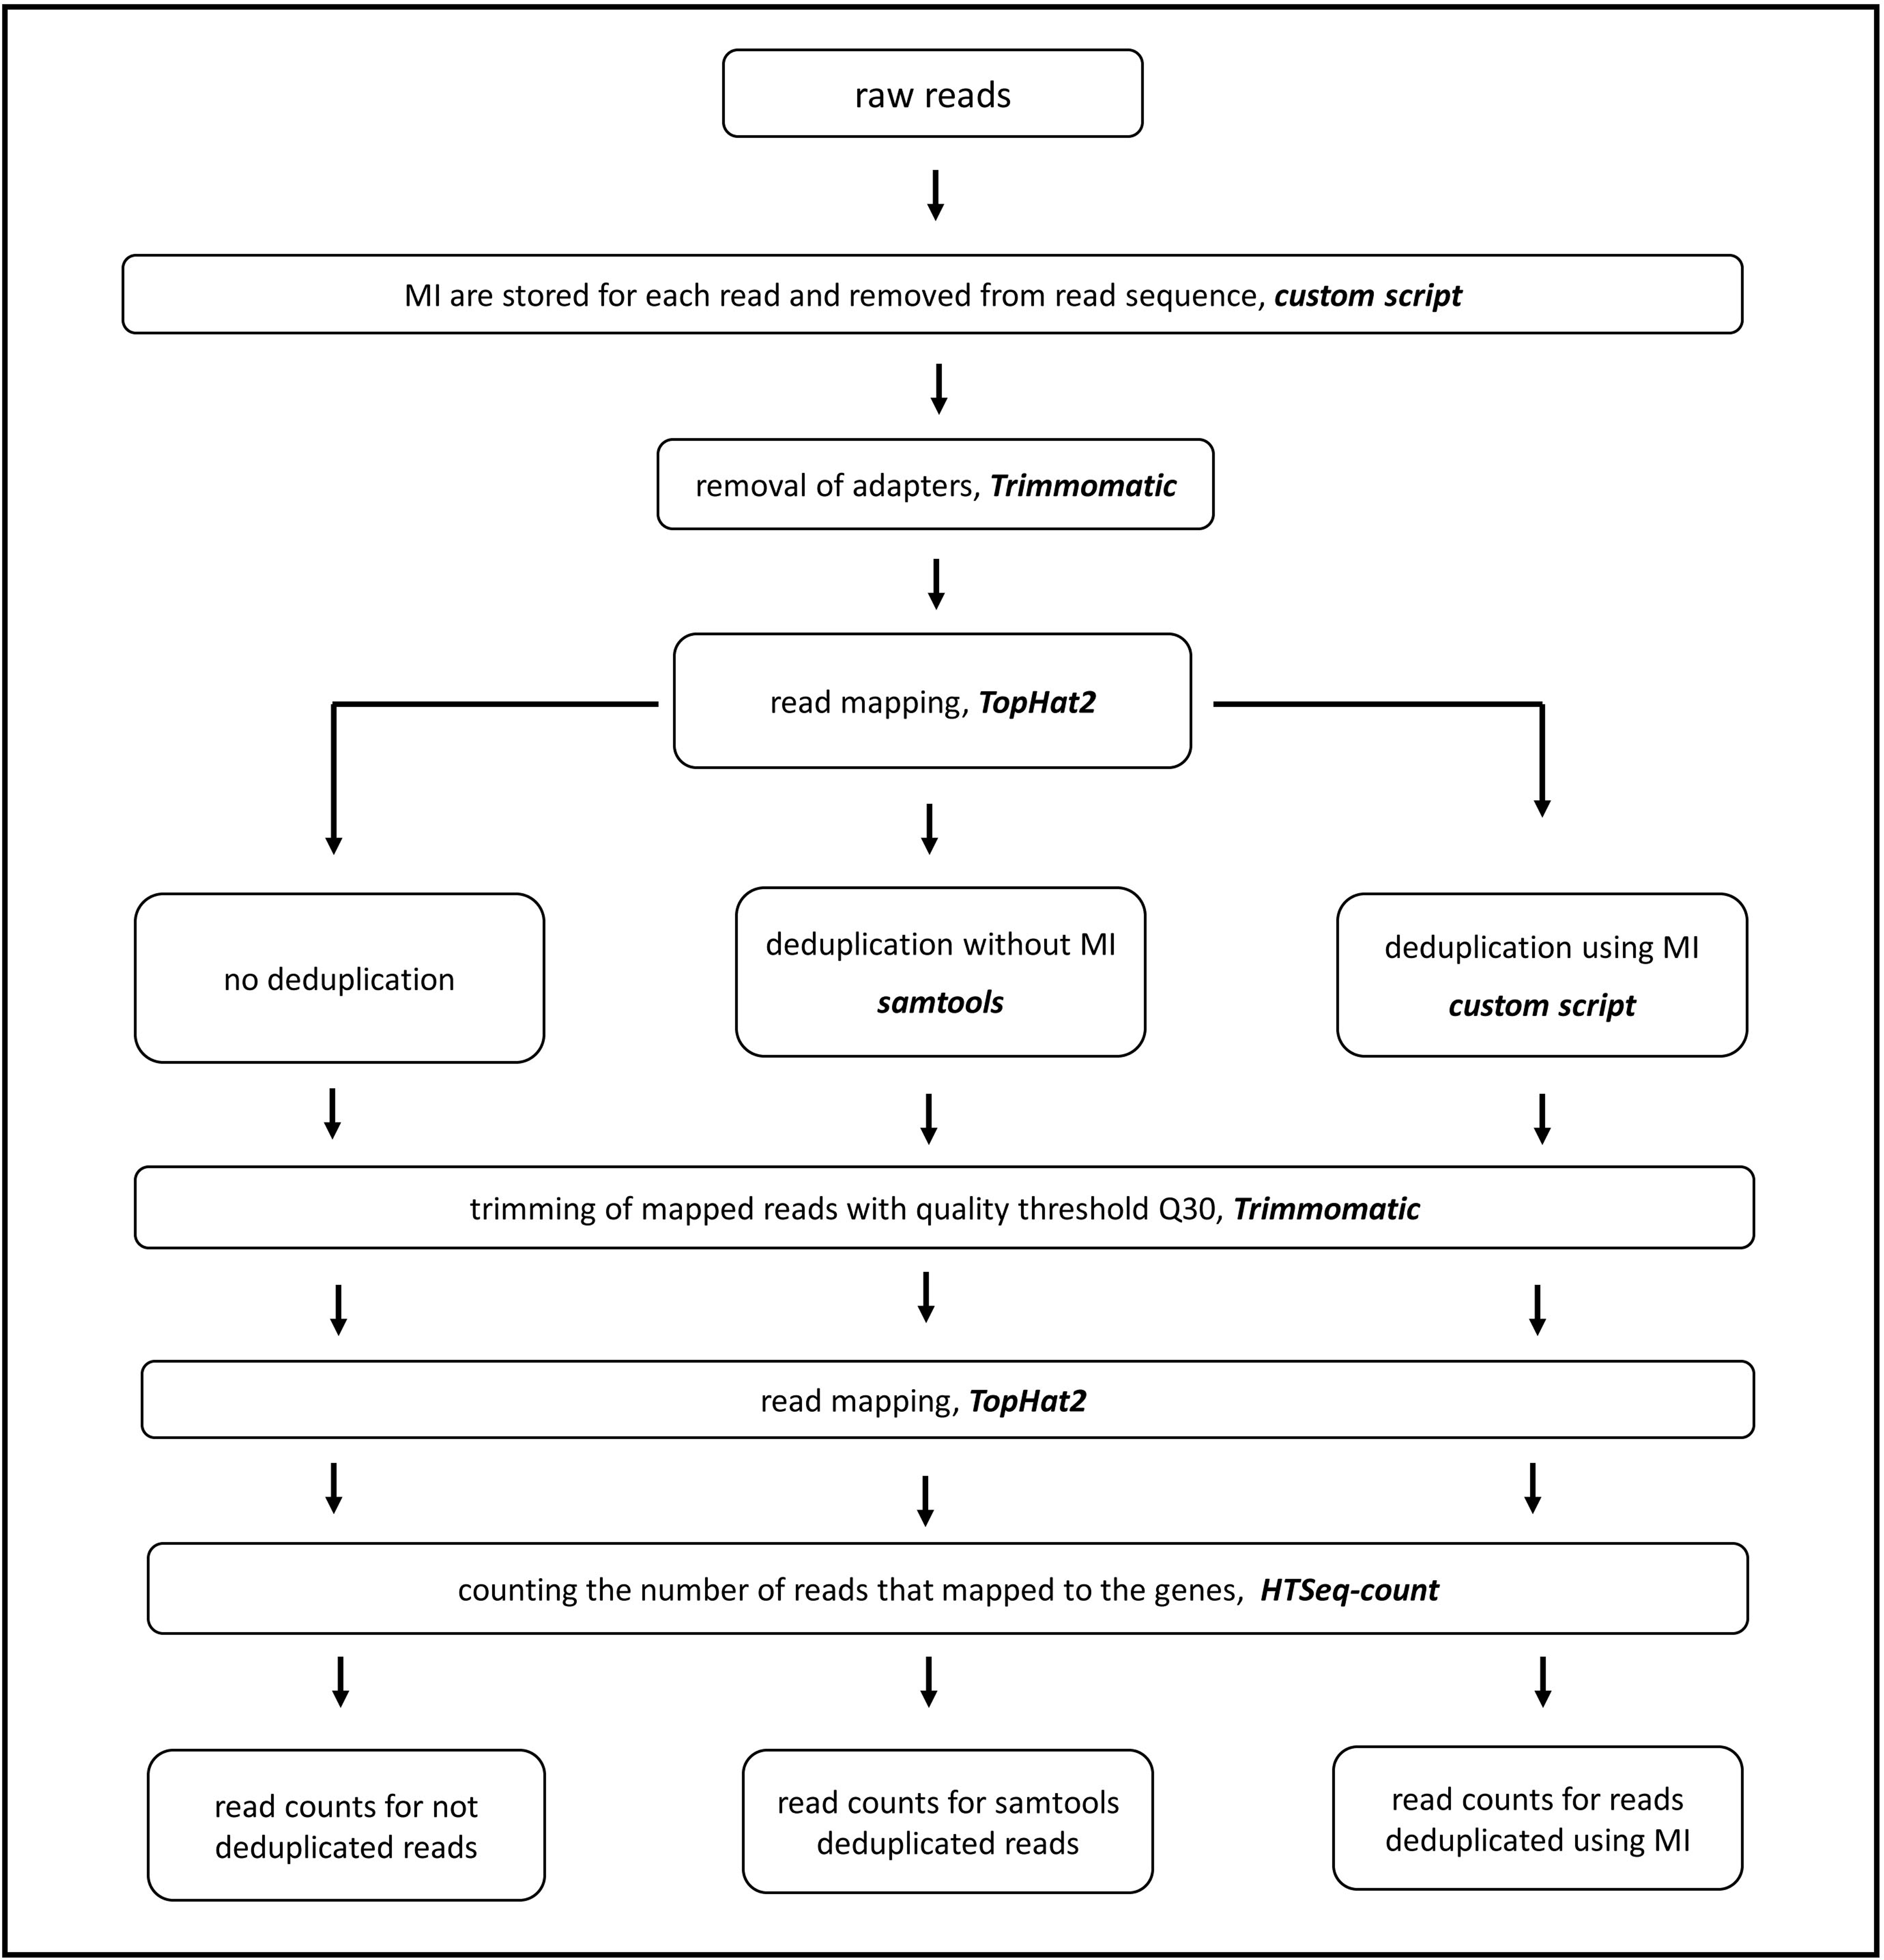 Effect of method of deduplication on estimation of